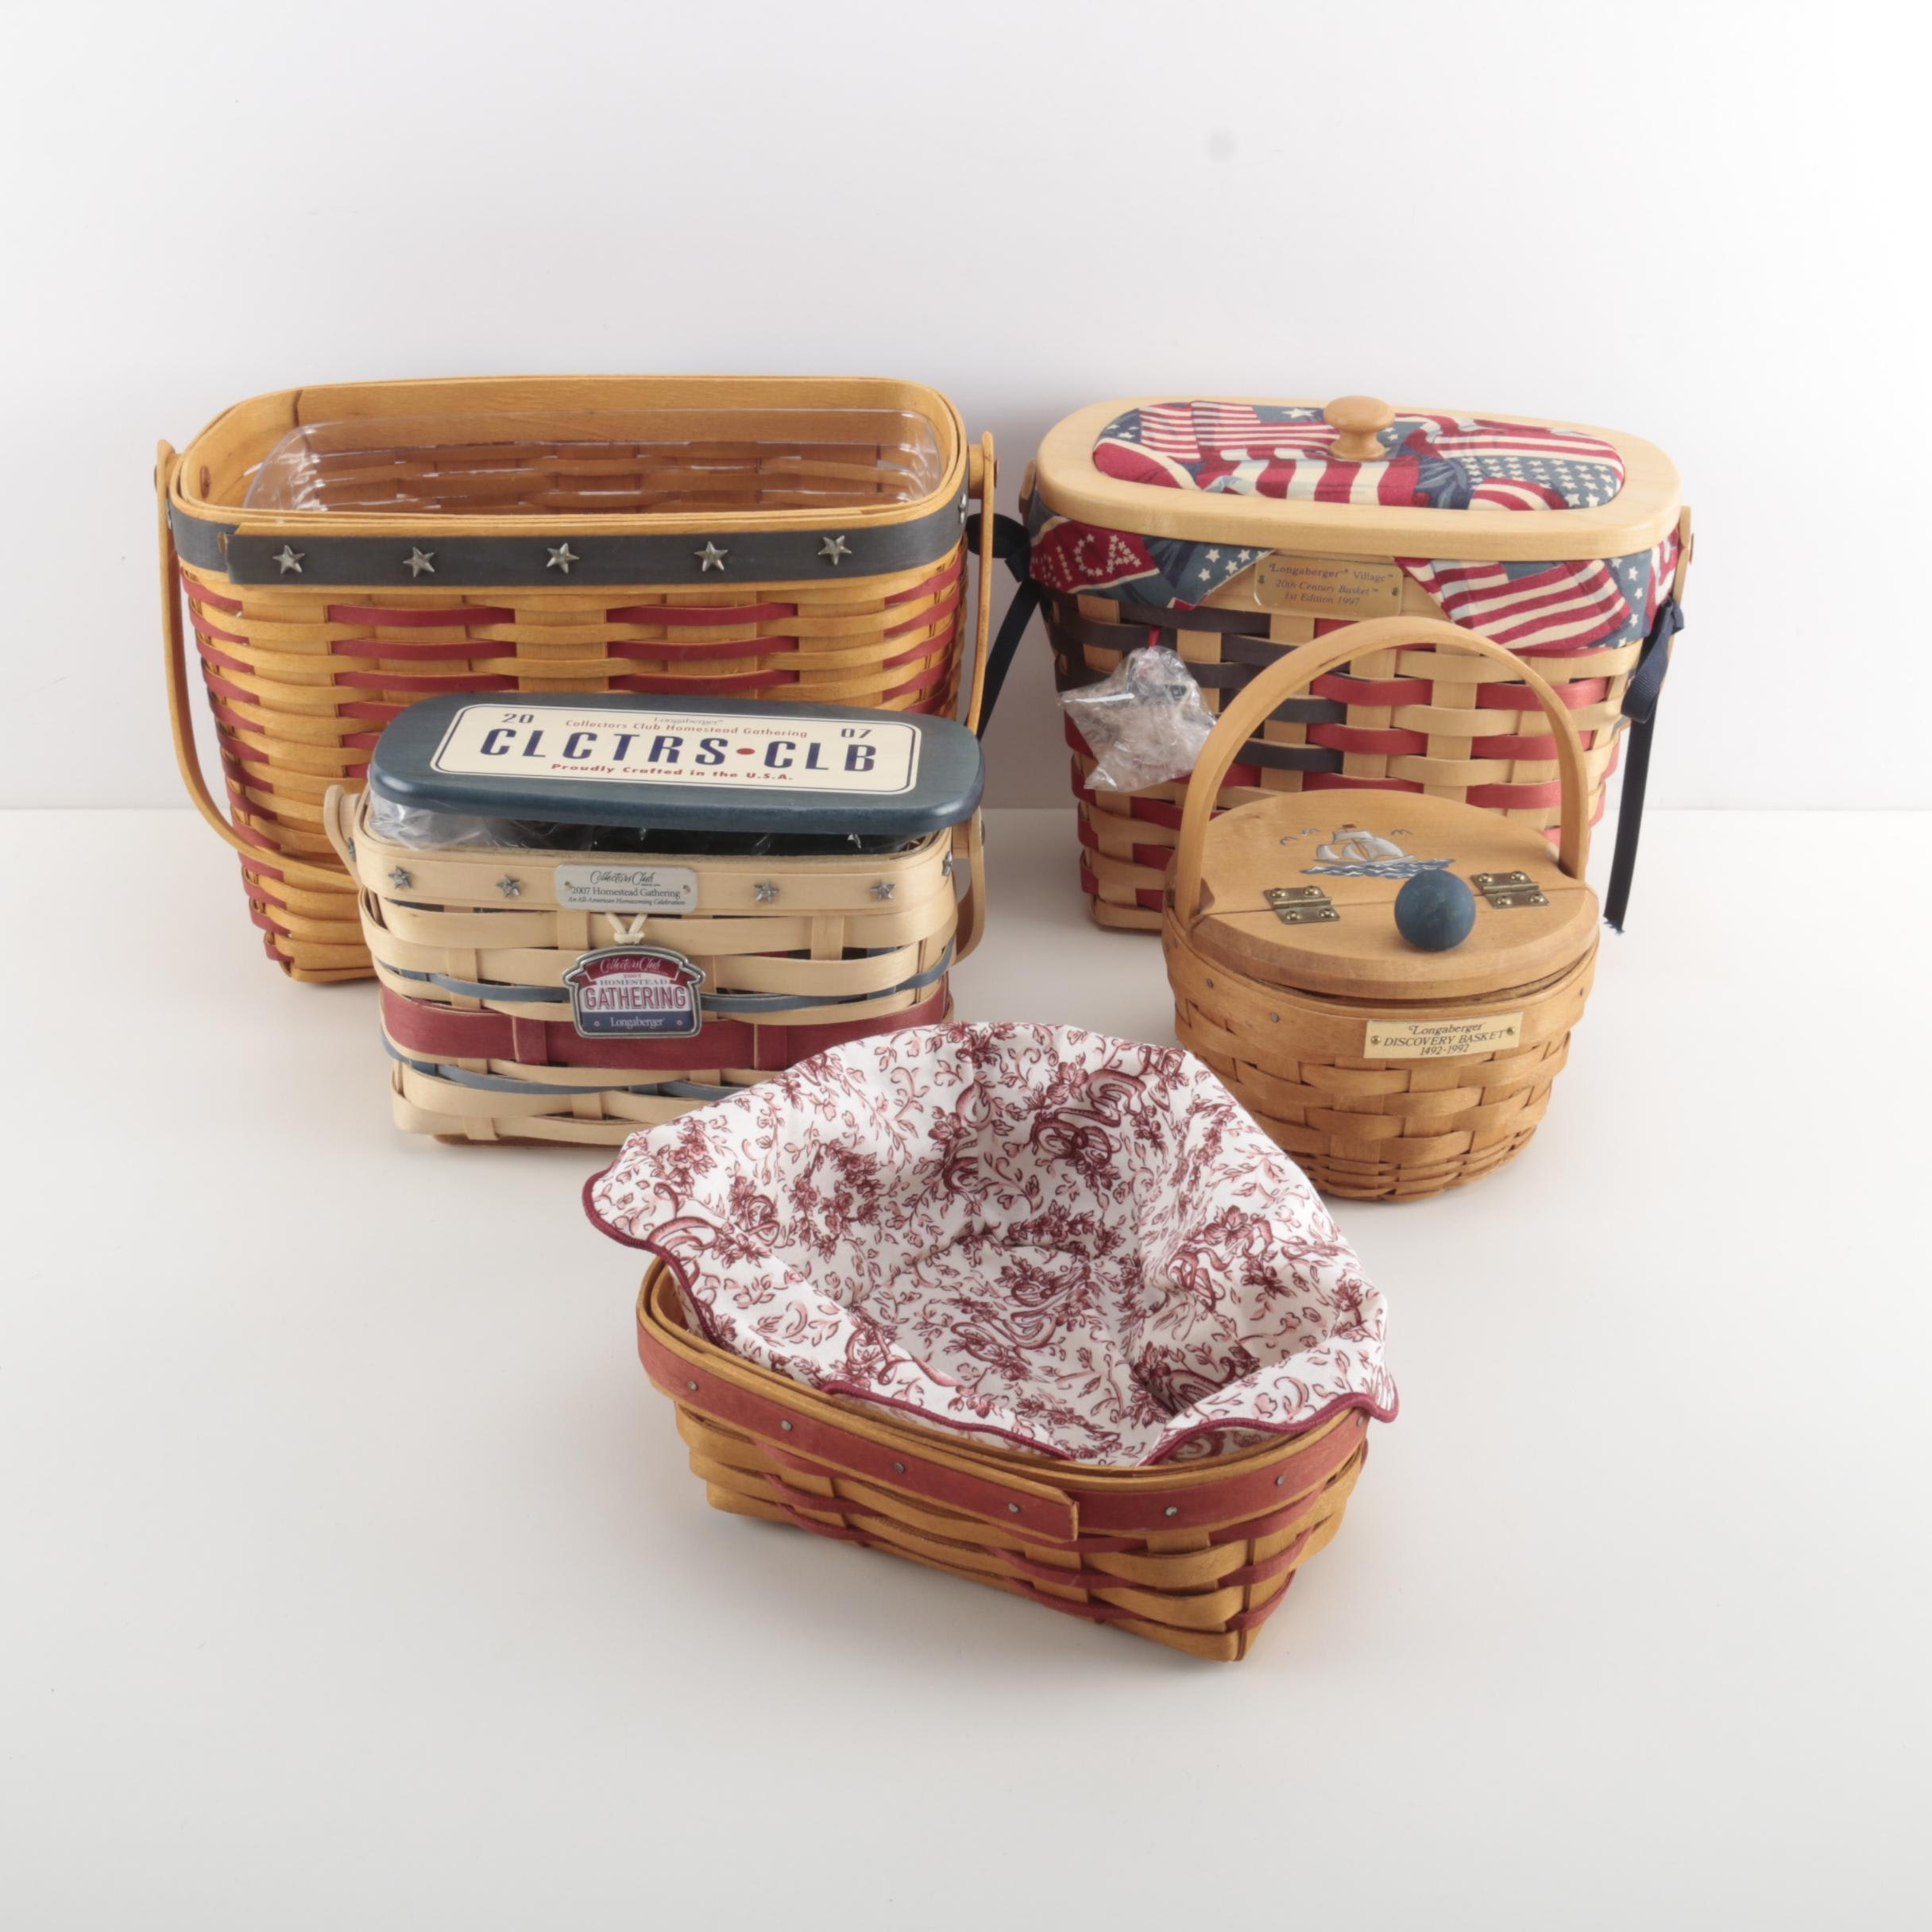 Longaberger Collector's Club Baskets